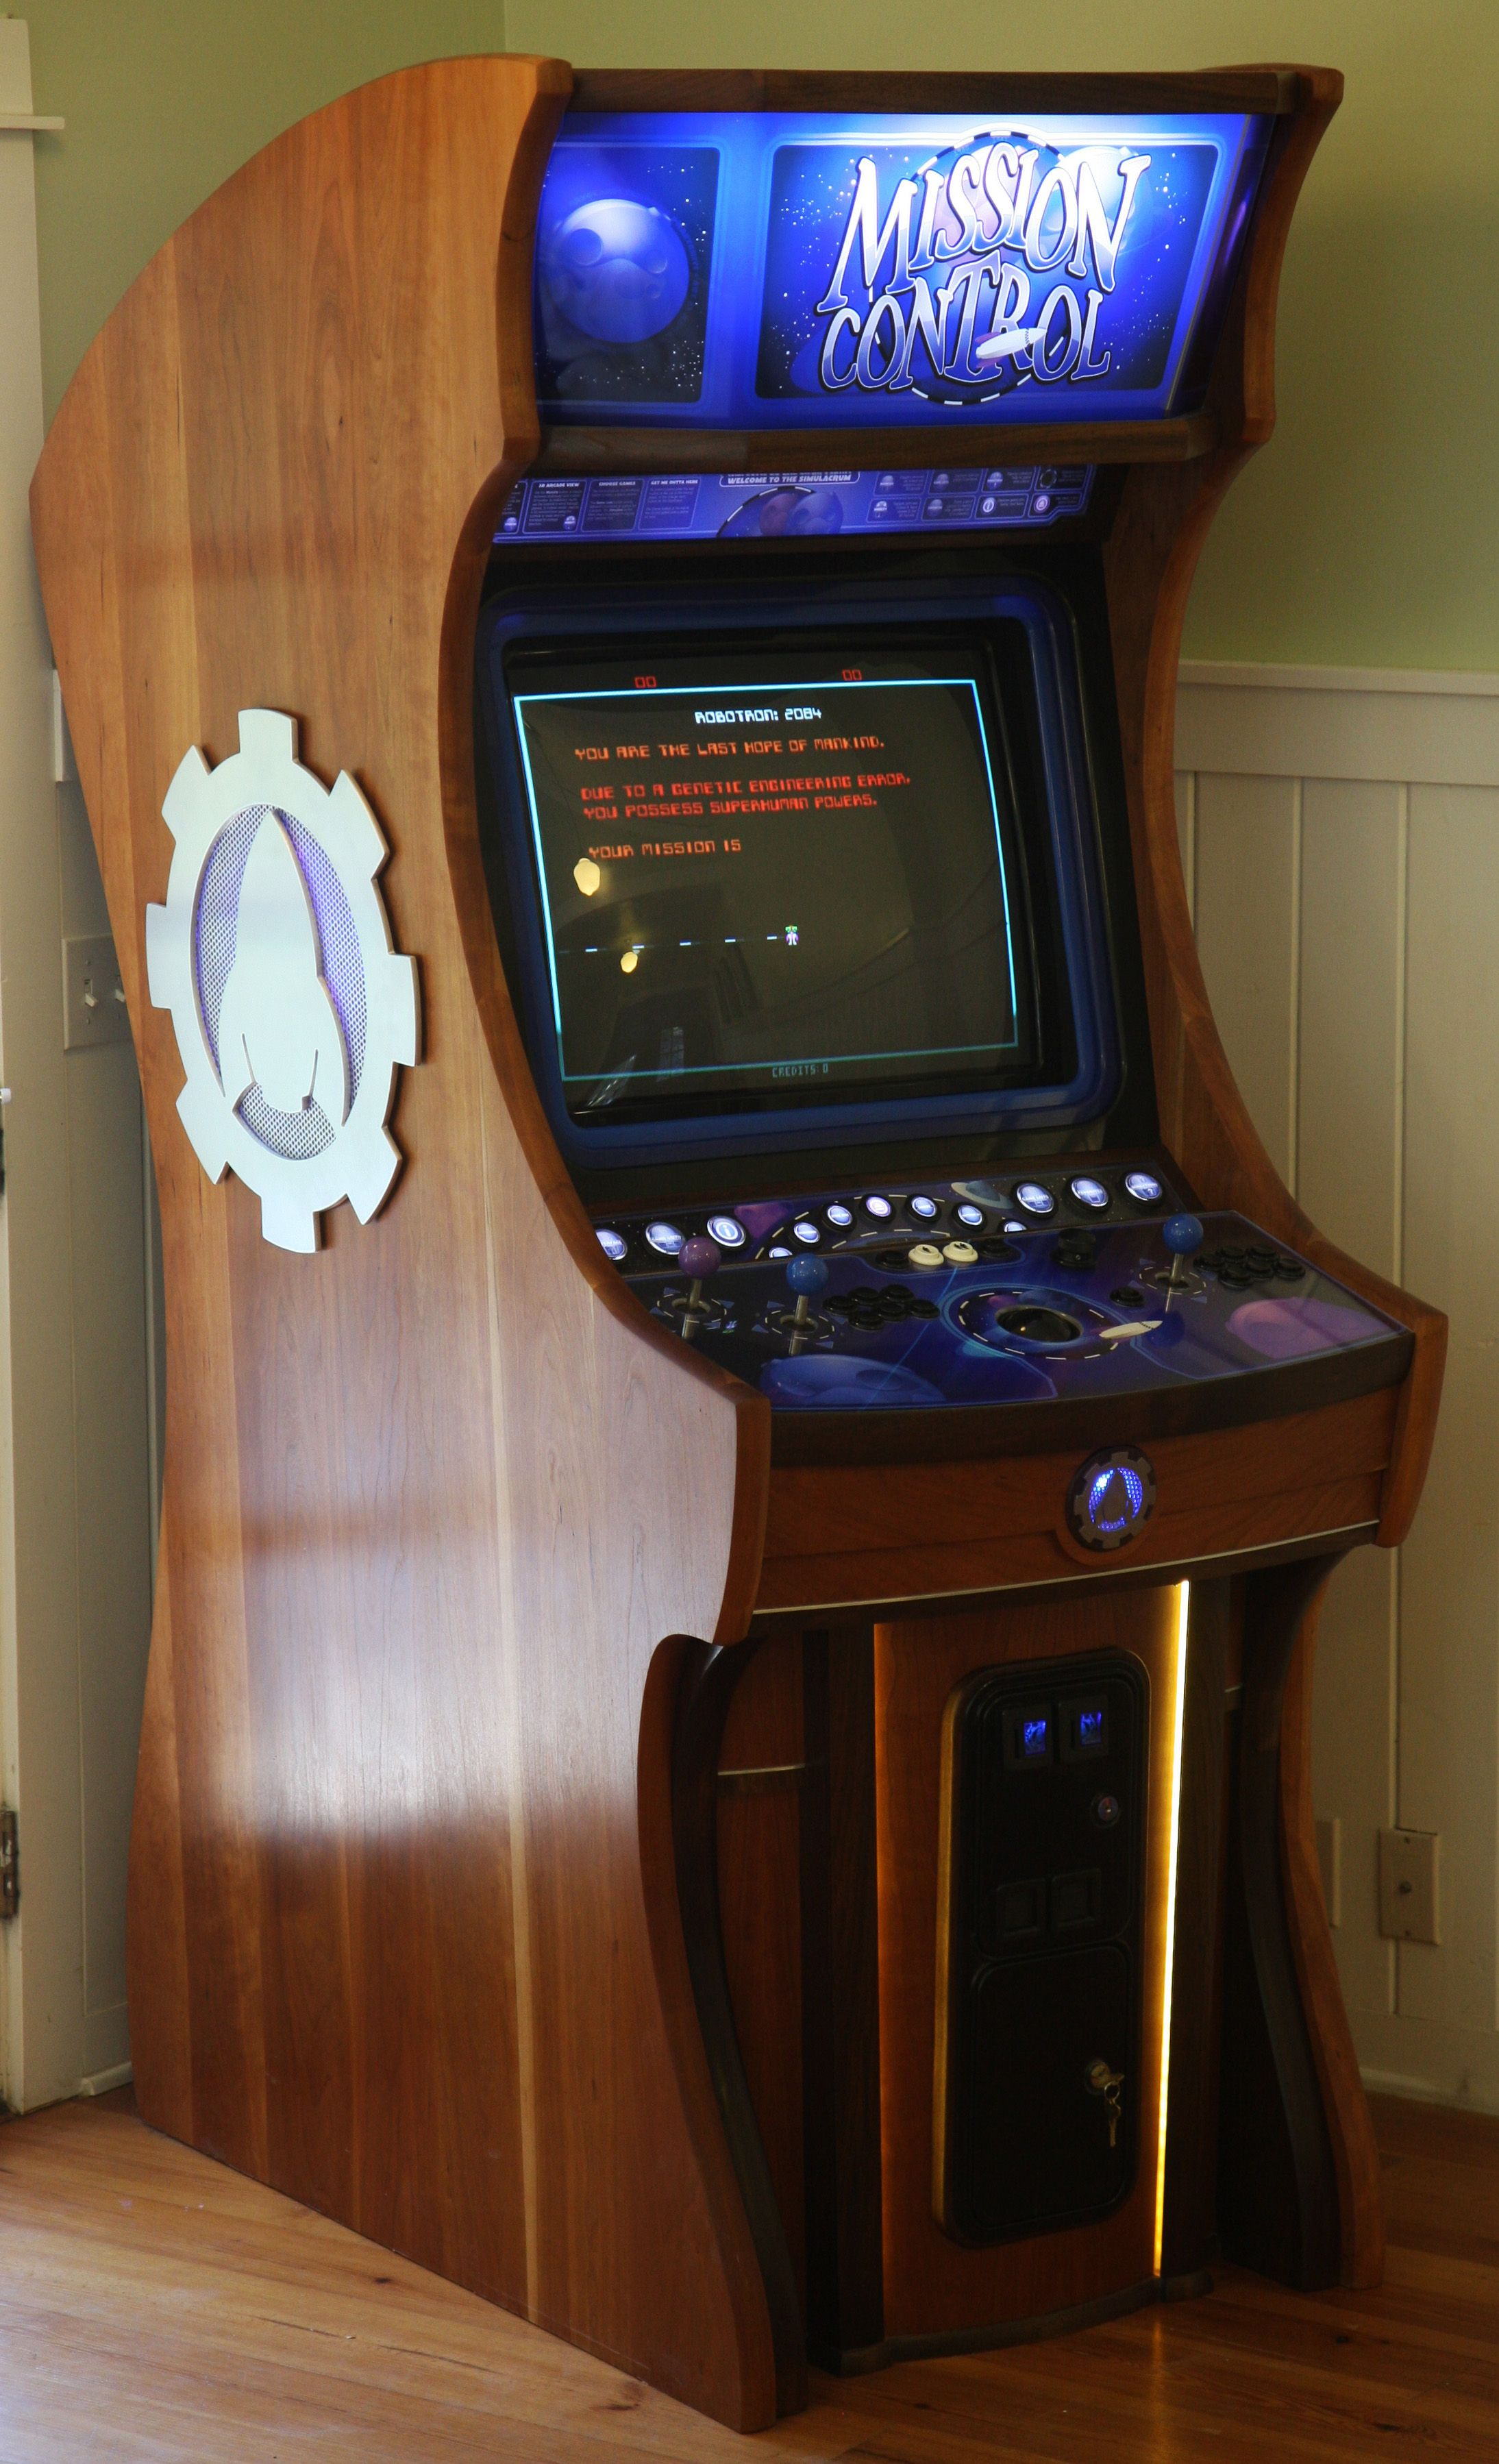 Mission Control Arcade Cabinet Arcade Games Amp Retro